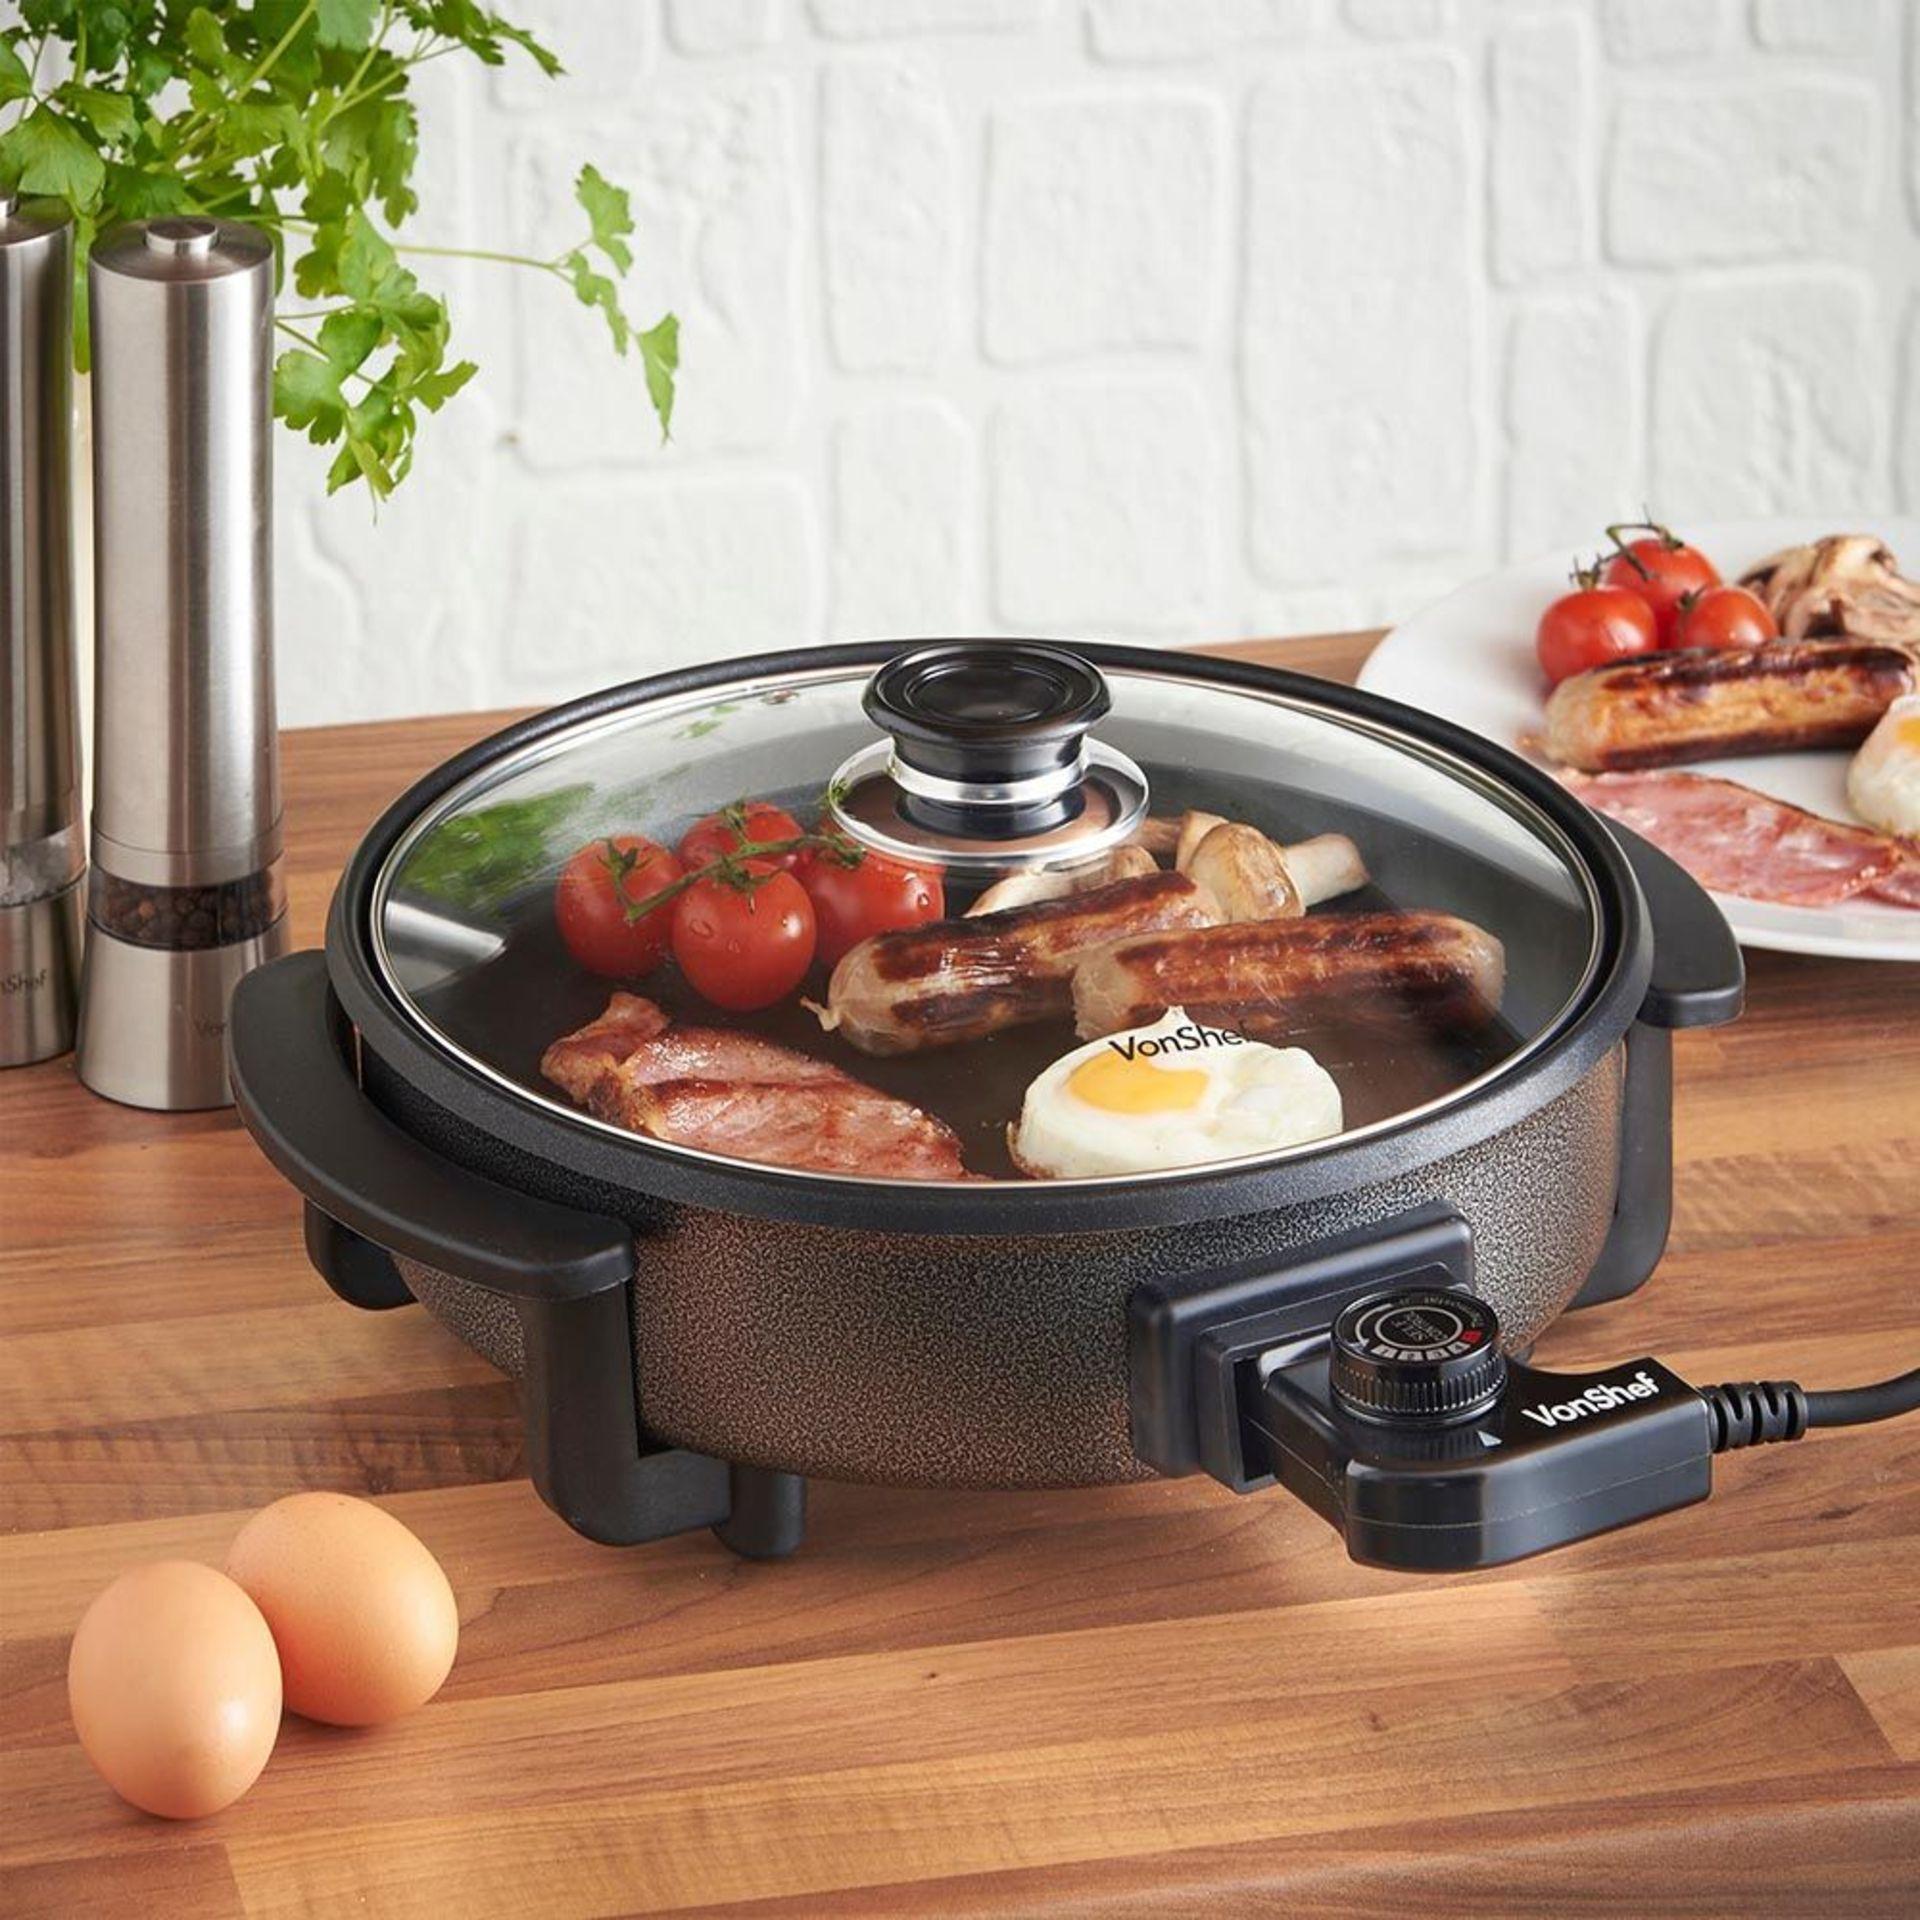 Los 62 - (KG38) 30cm Round Multi Cooker. Convenient and easy to use cooker that frys, Sautés, Braises, ...